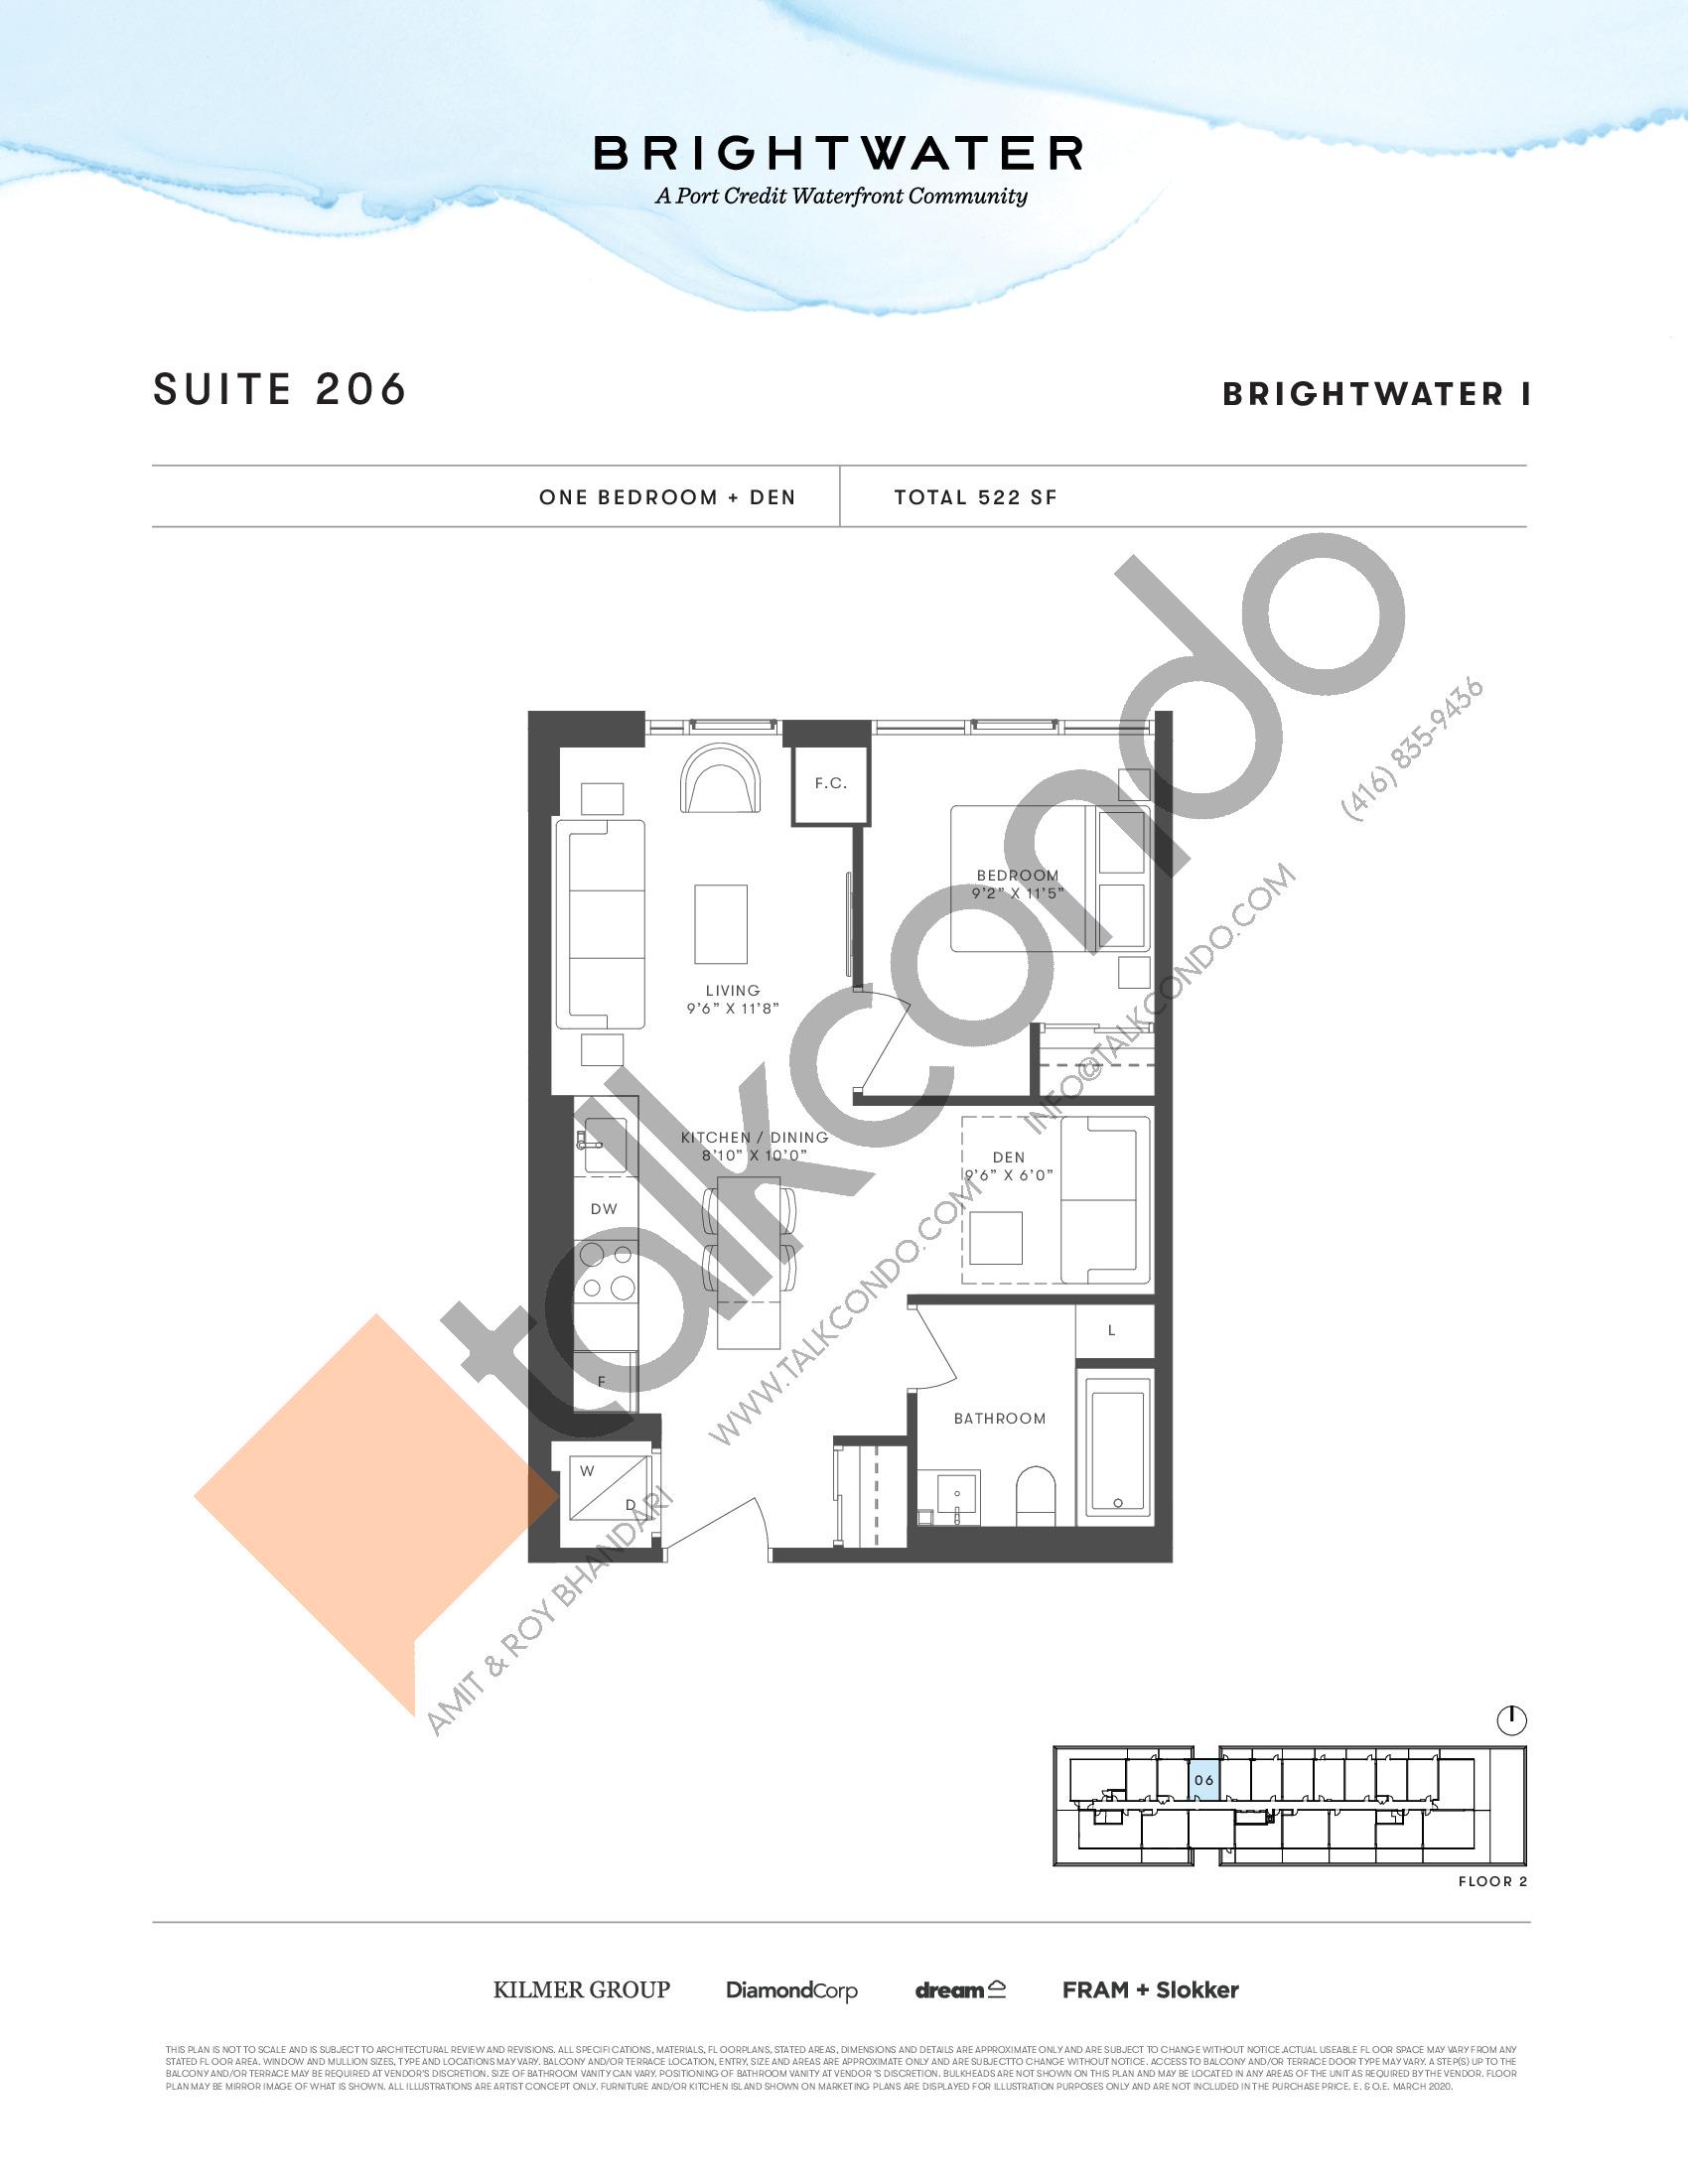 Suite 206 Floor Plan at Brightwater I Condos - 522 sq.ft